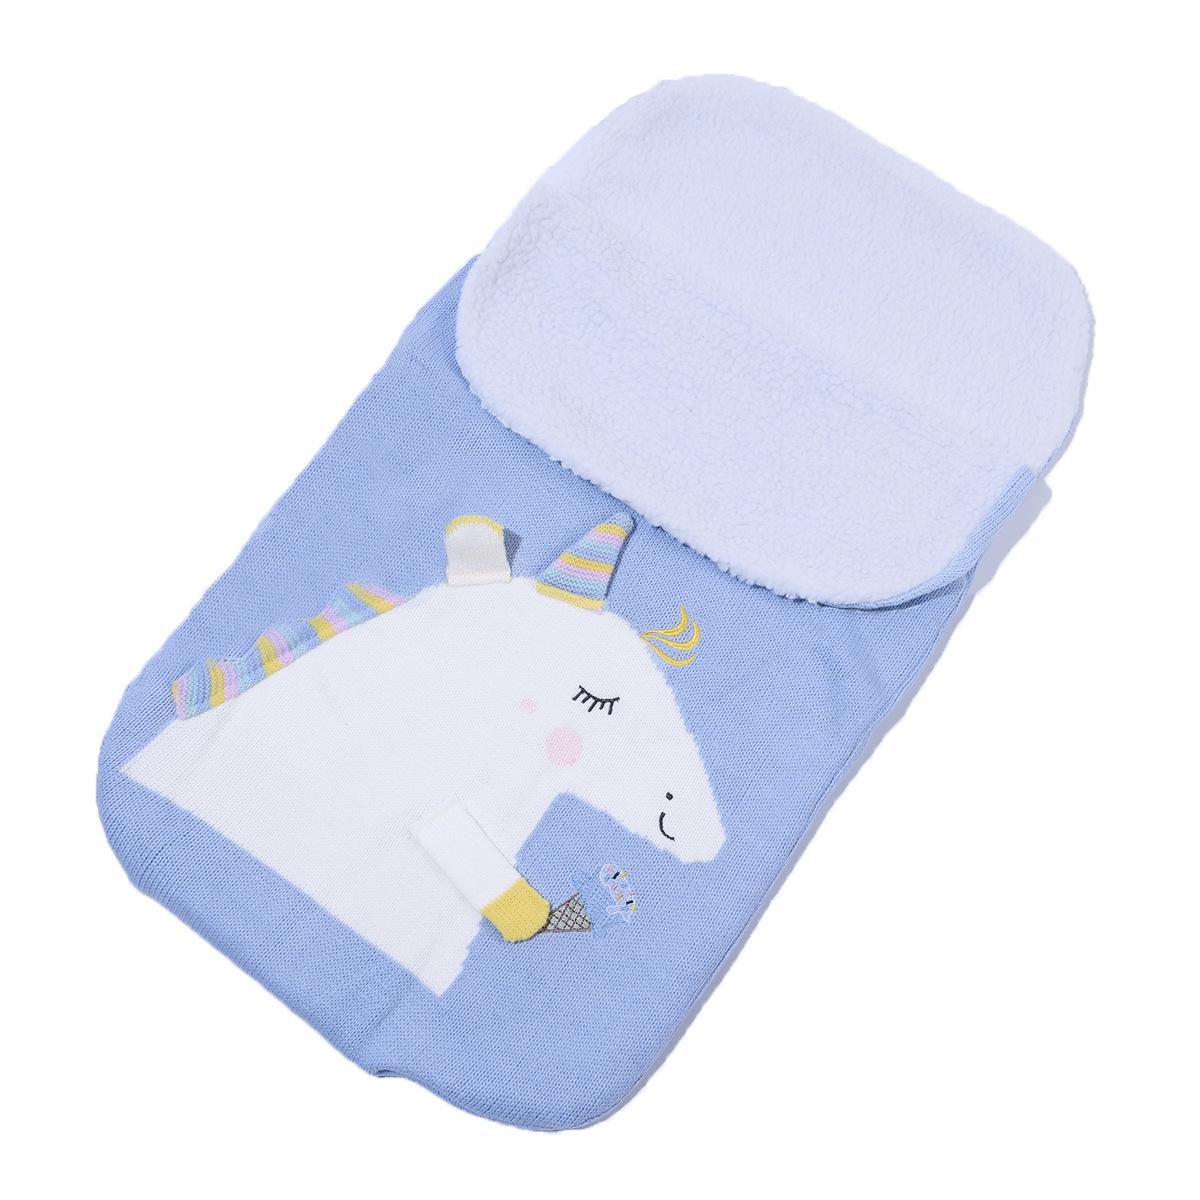 Newborn Baby Wrap Swaddle Knit Blanket Unicorn Sleeping Bag